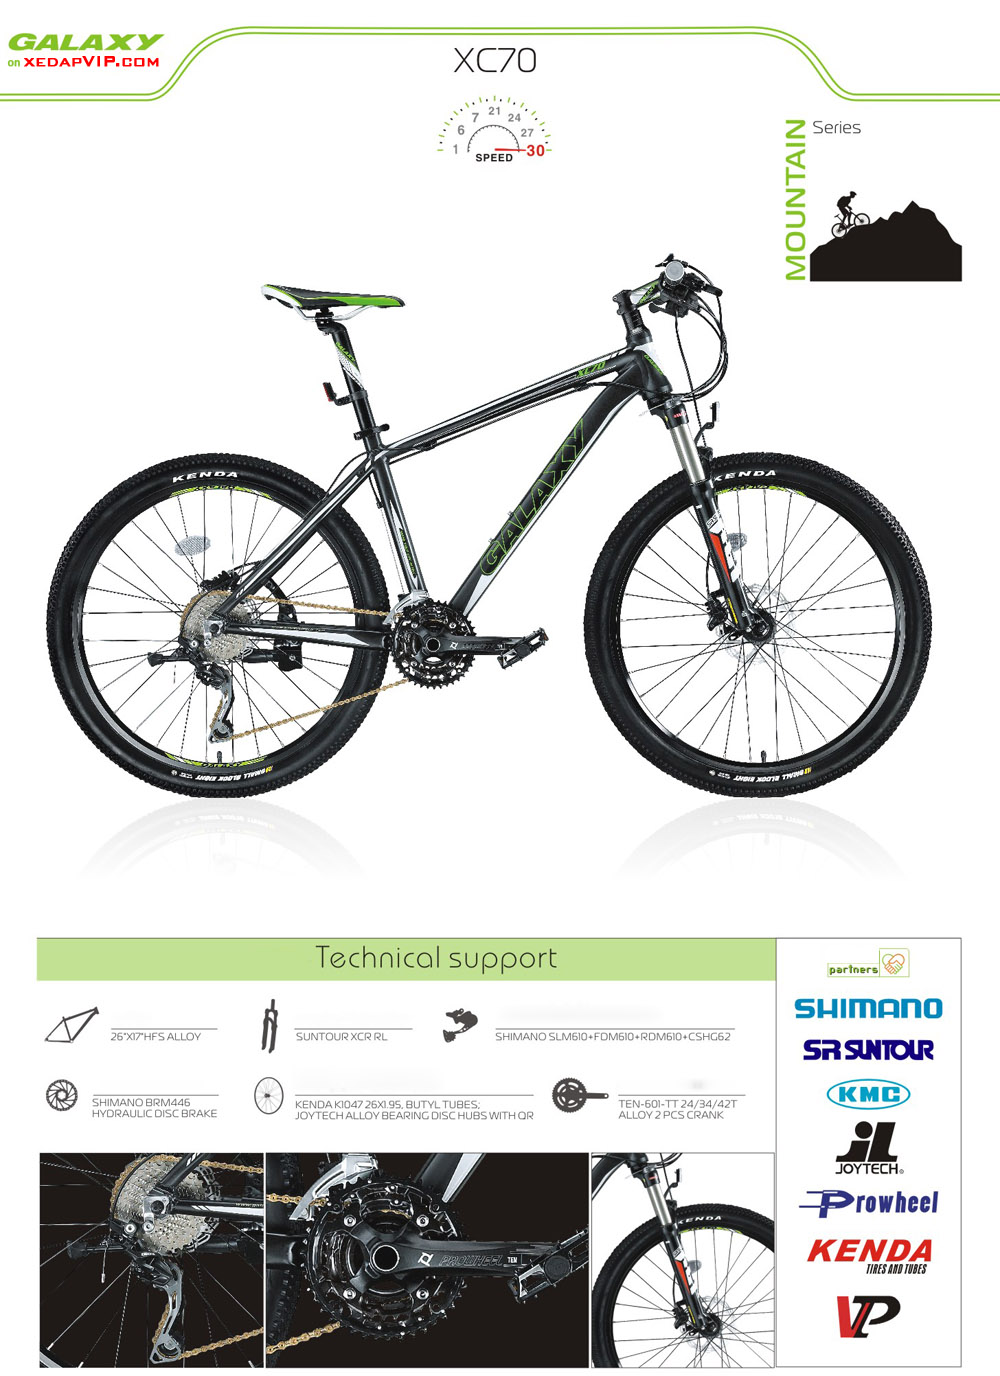 Xe dap the thao GALAXY XC70, xe dap the thao, xe dap trinx, xe đạp thể thao chính hãng, xe dap asama, XC70